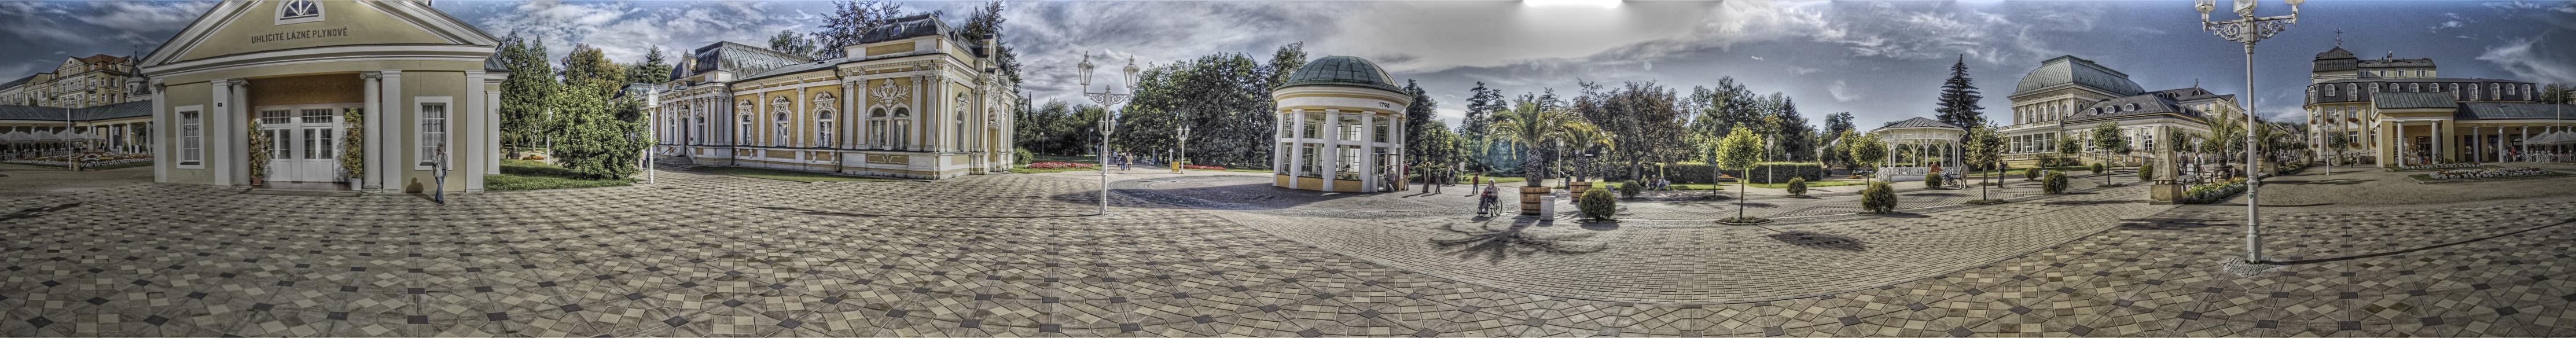 Franzensbad | 360° HDR Panorama